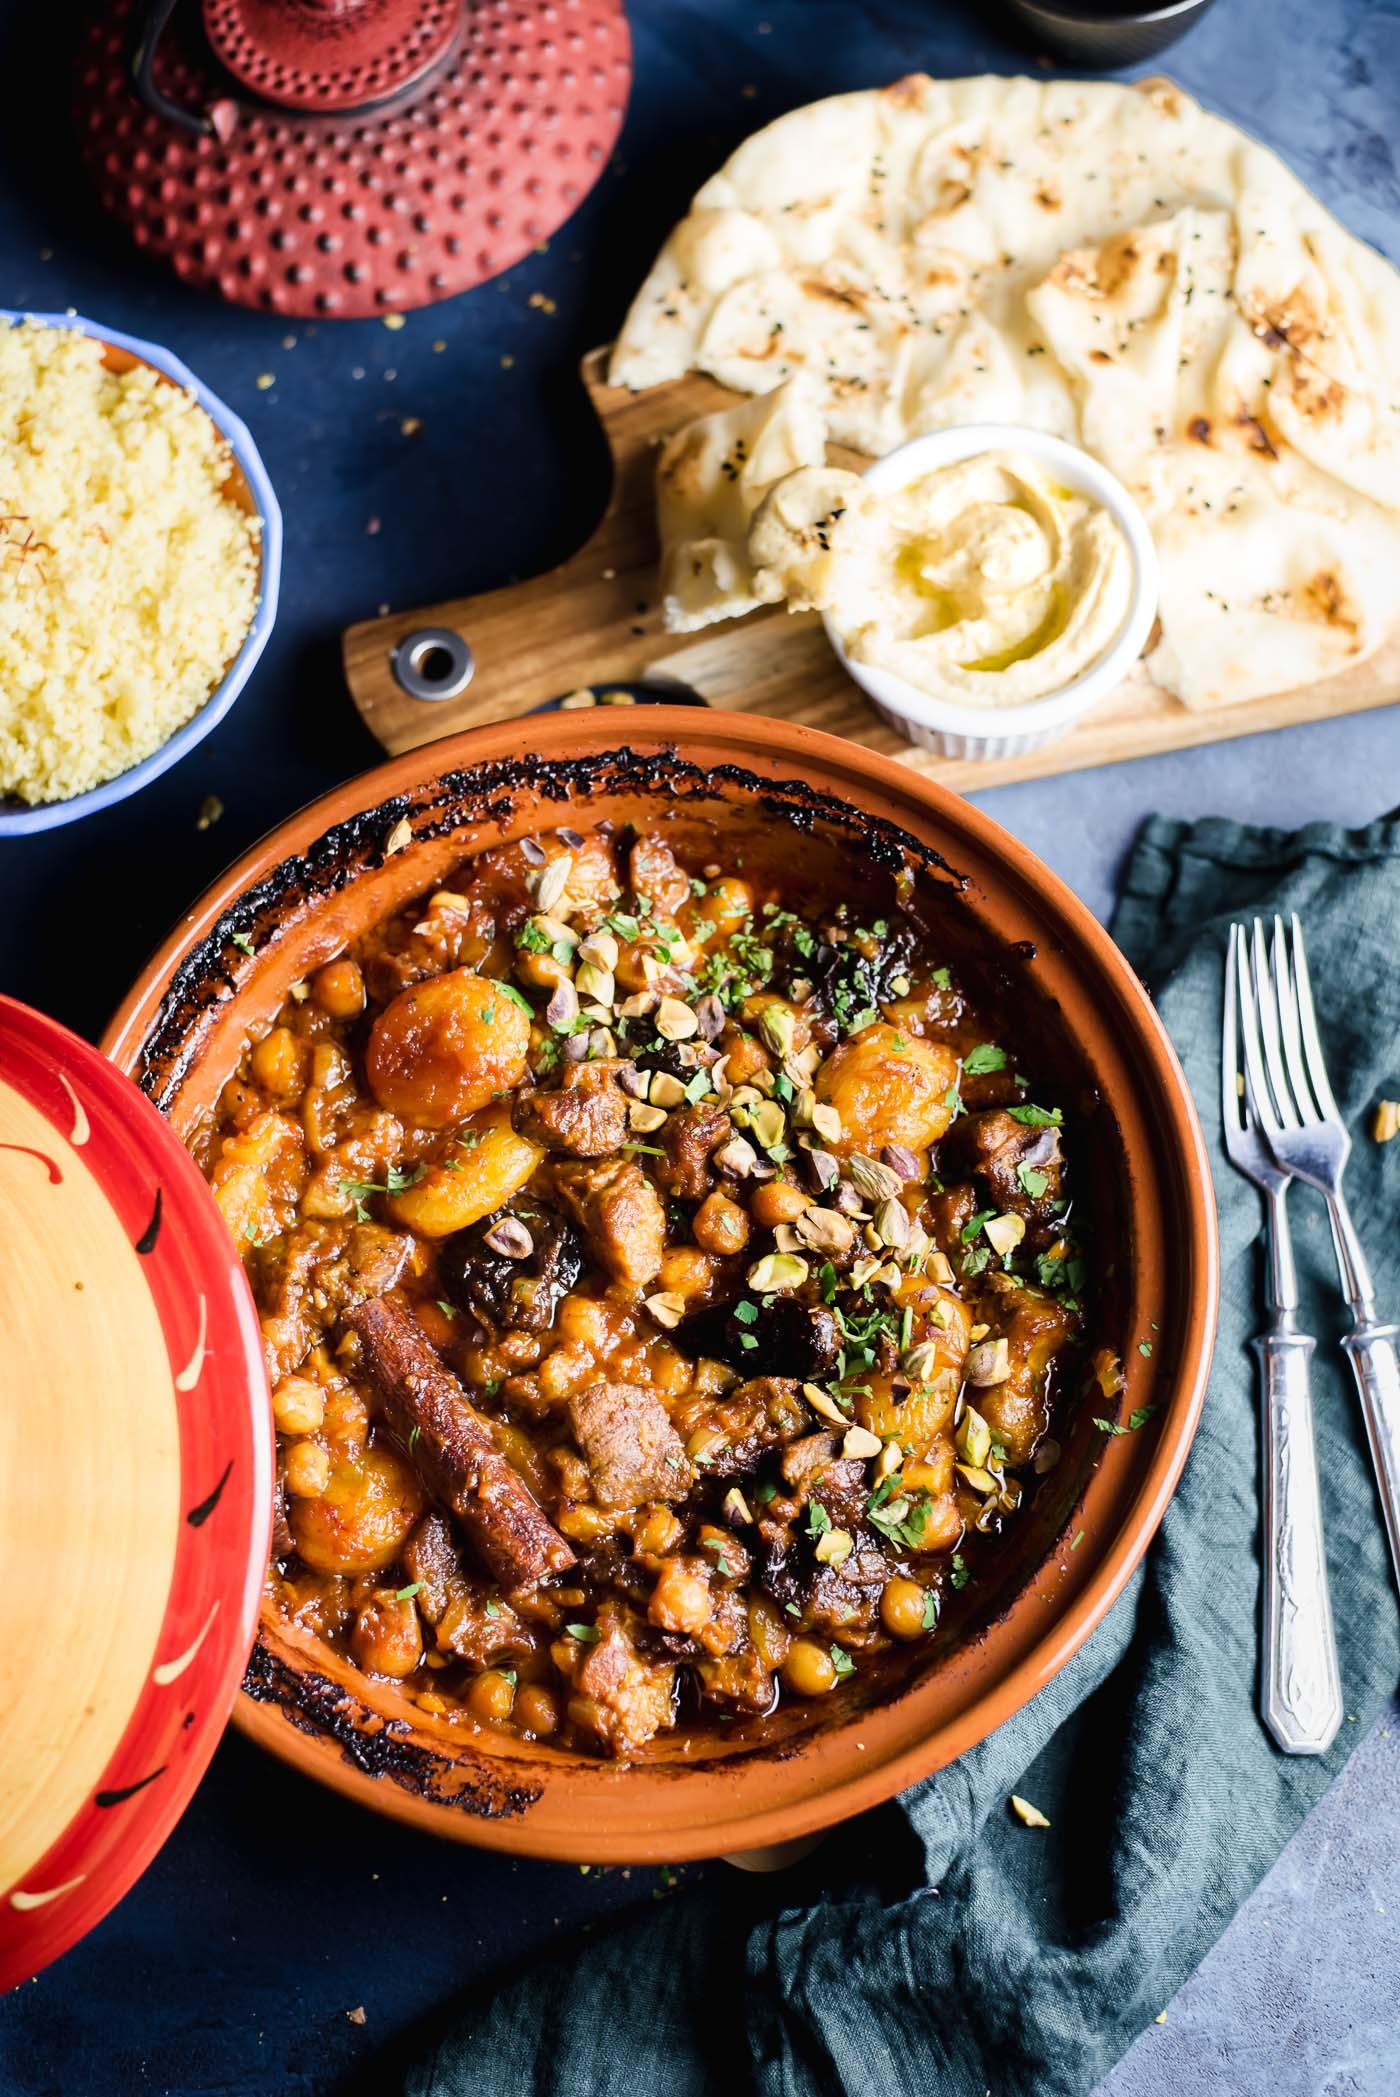 Mutton shurpa - prepare a masterpiece of oriental cuisine 45